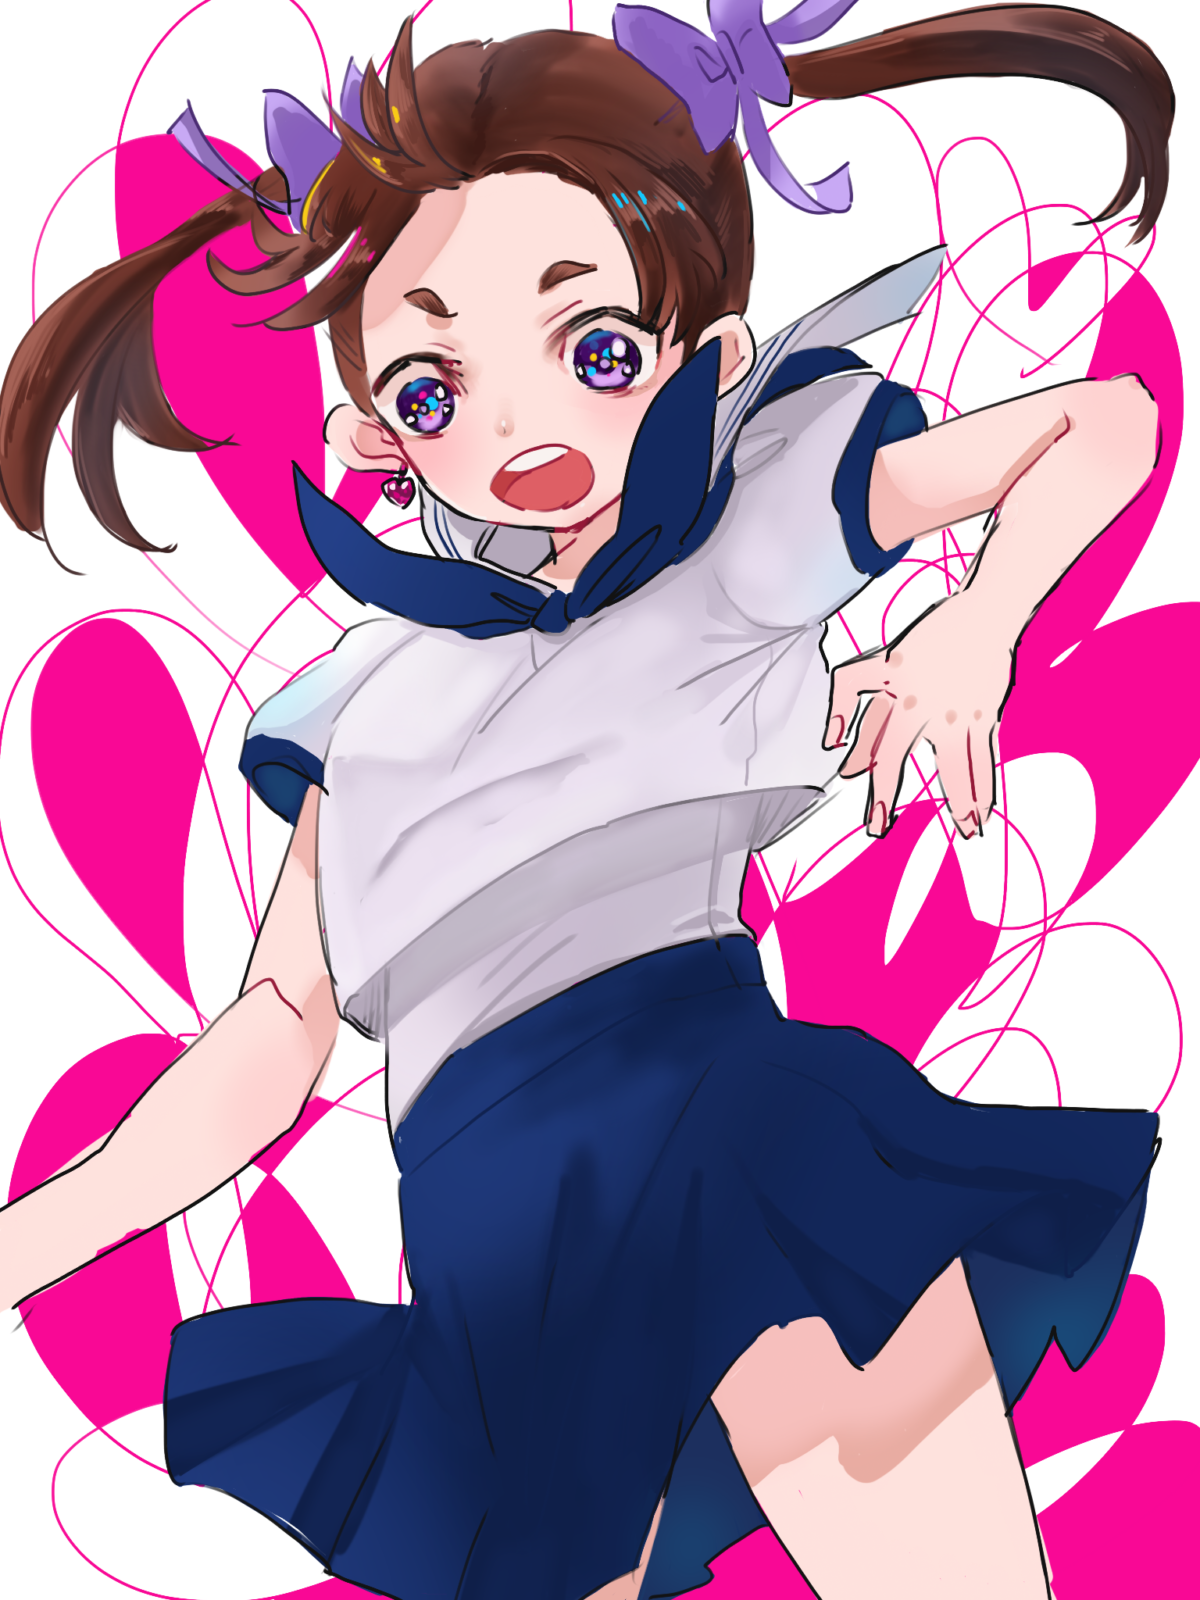 illust-character01